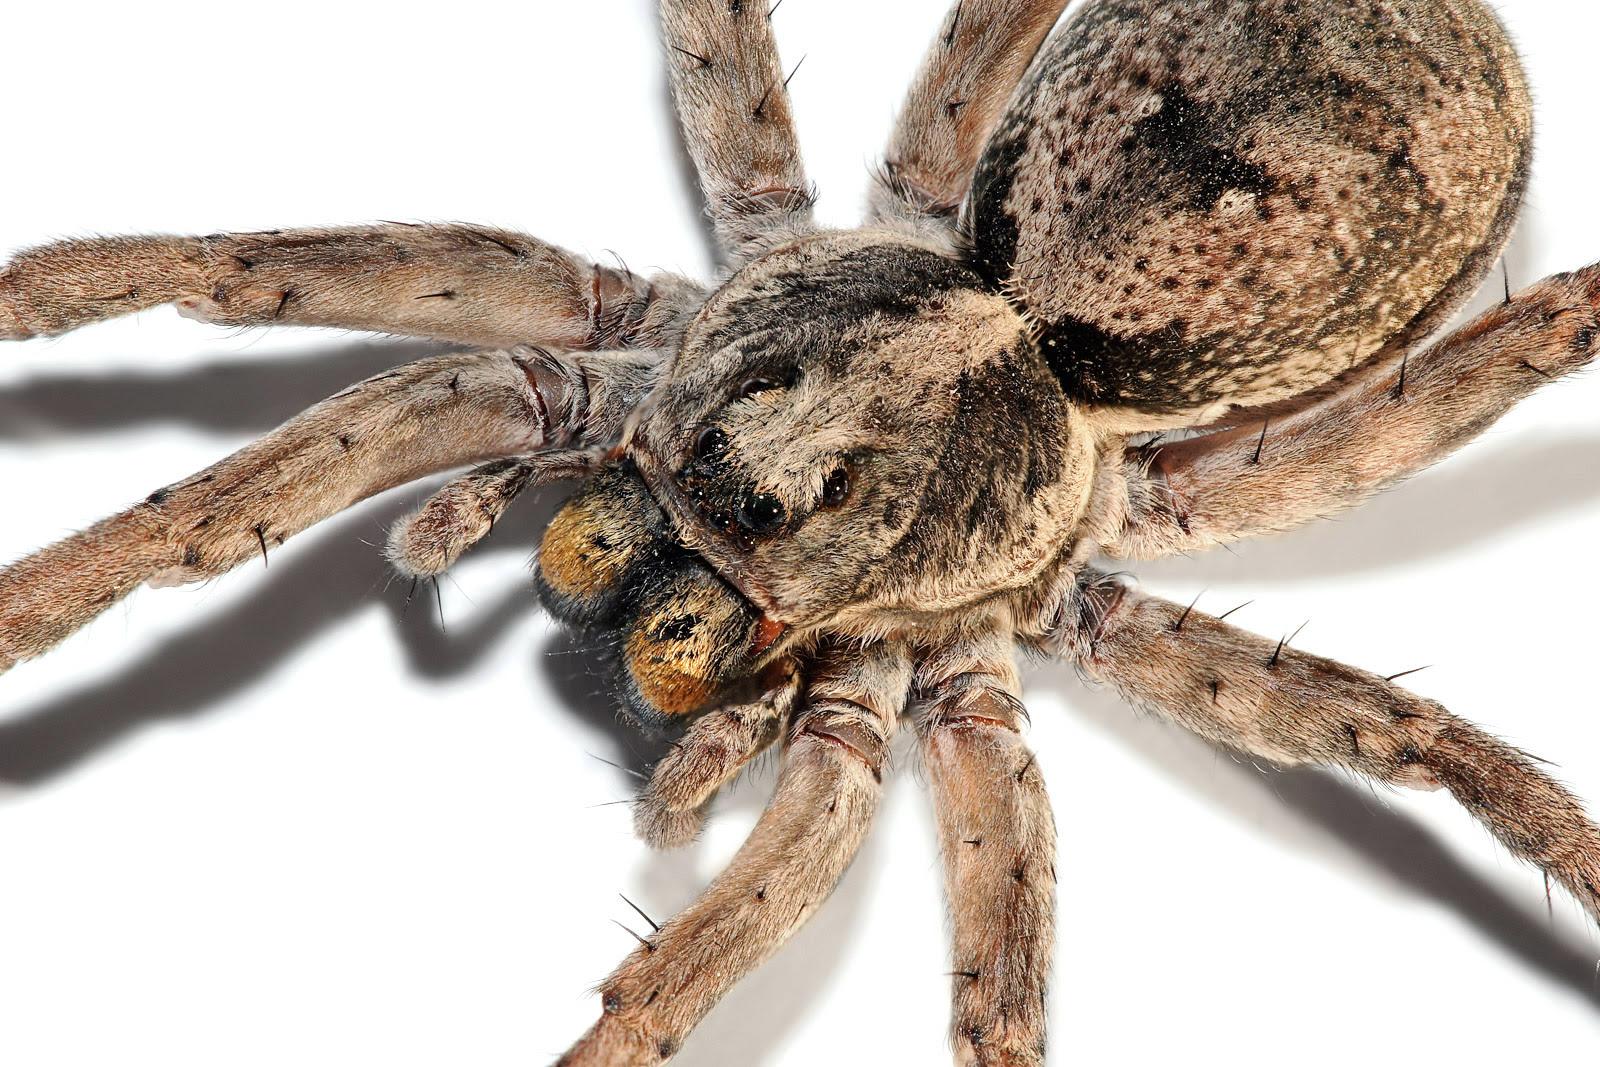 http://upload.wikimedia.org/wikipedia/commons/7/73/Wolf_spider_focus_bracket02.jpg